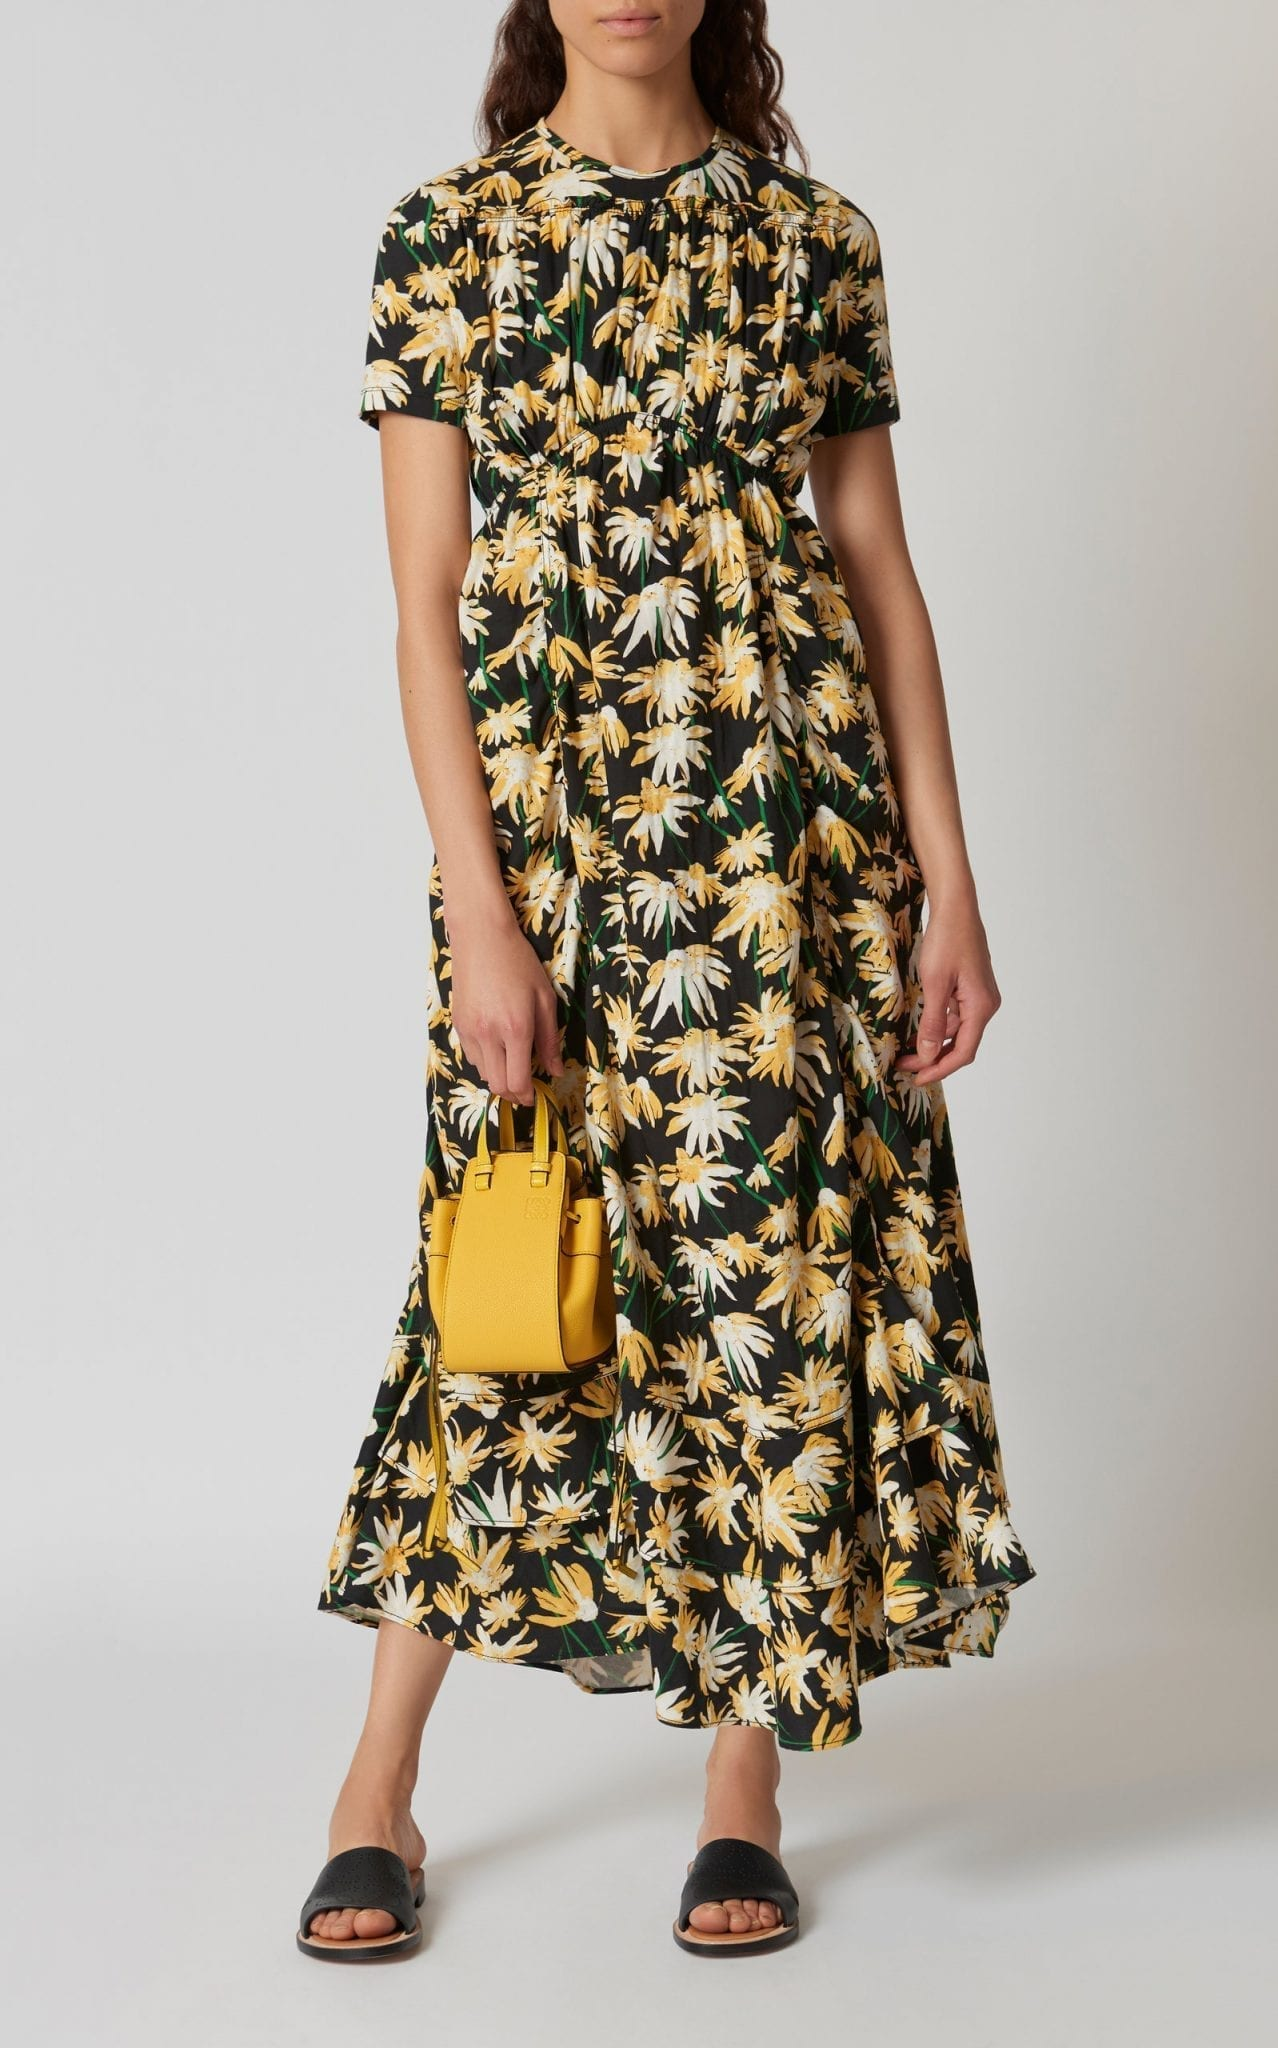 LOEWE Gathered Cotton Maxi Dress